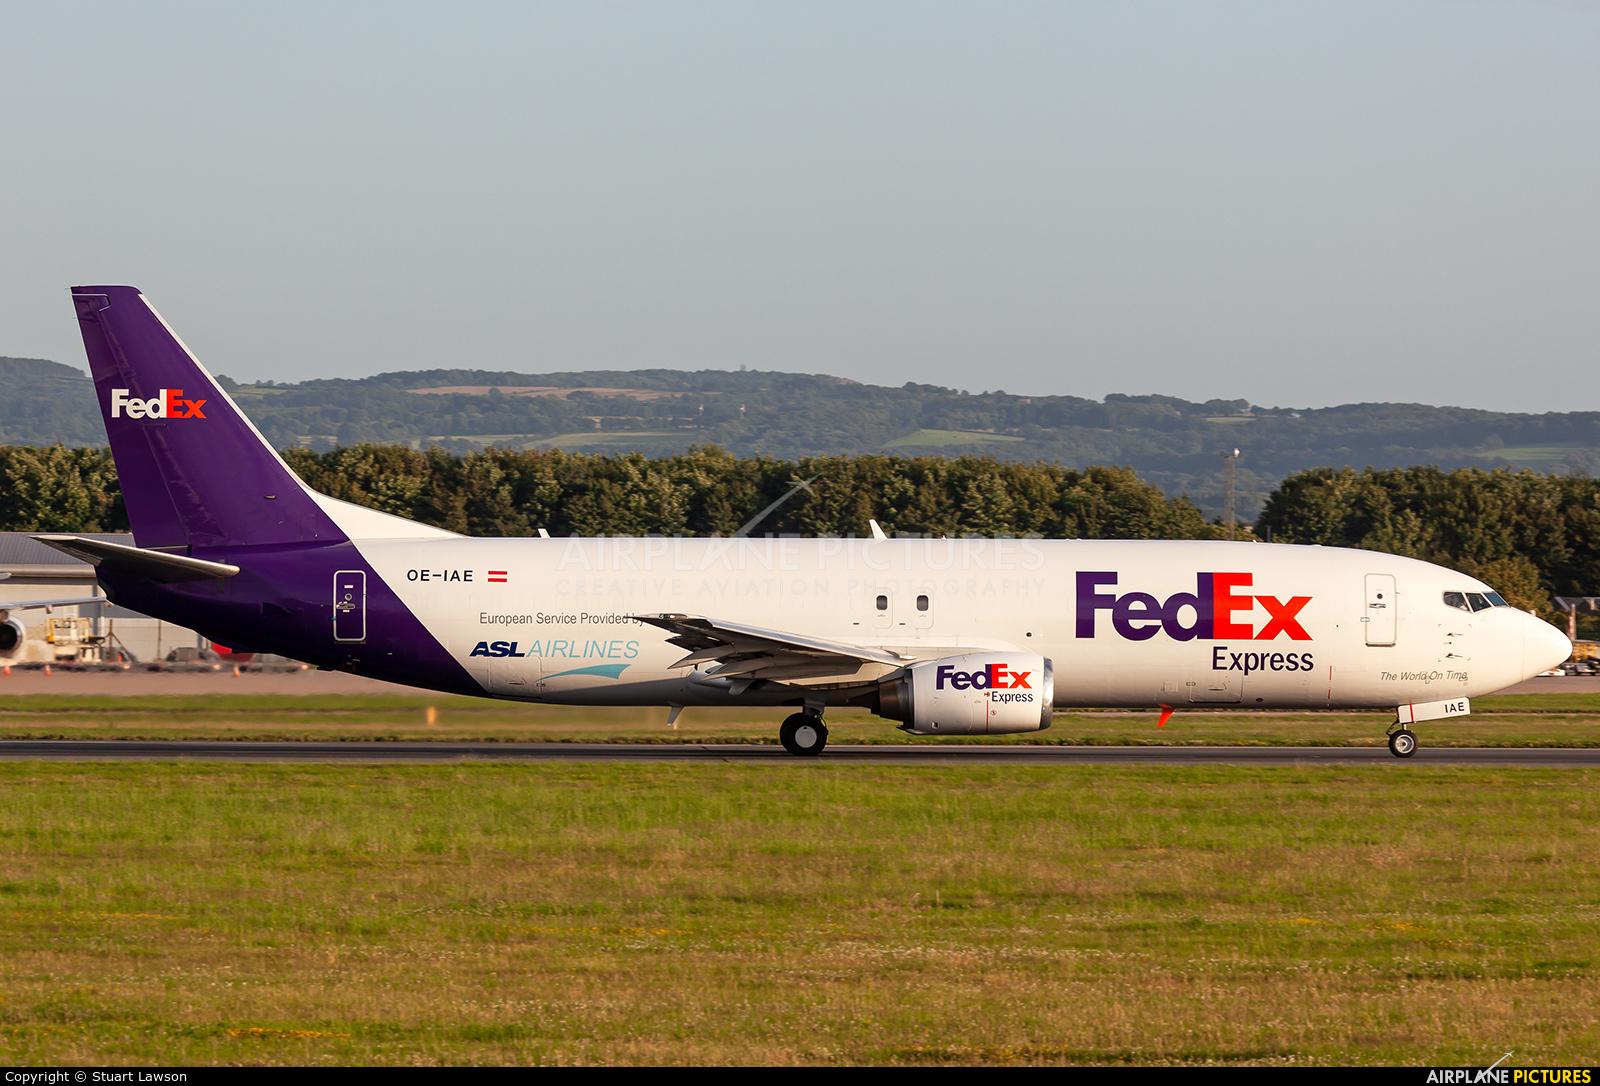 FedEx Federal Express OE-IAE aircraft at East Midlands